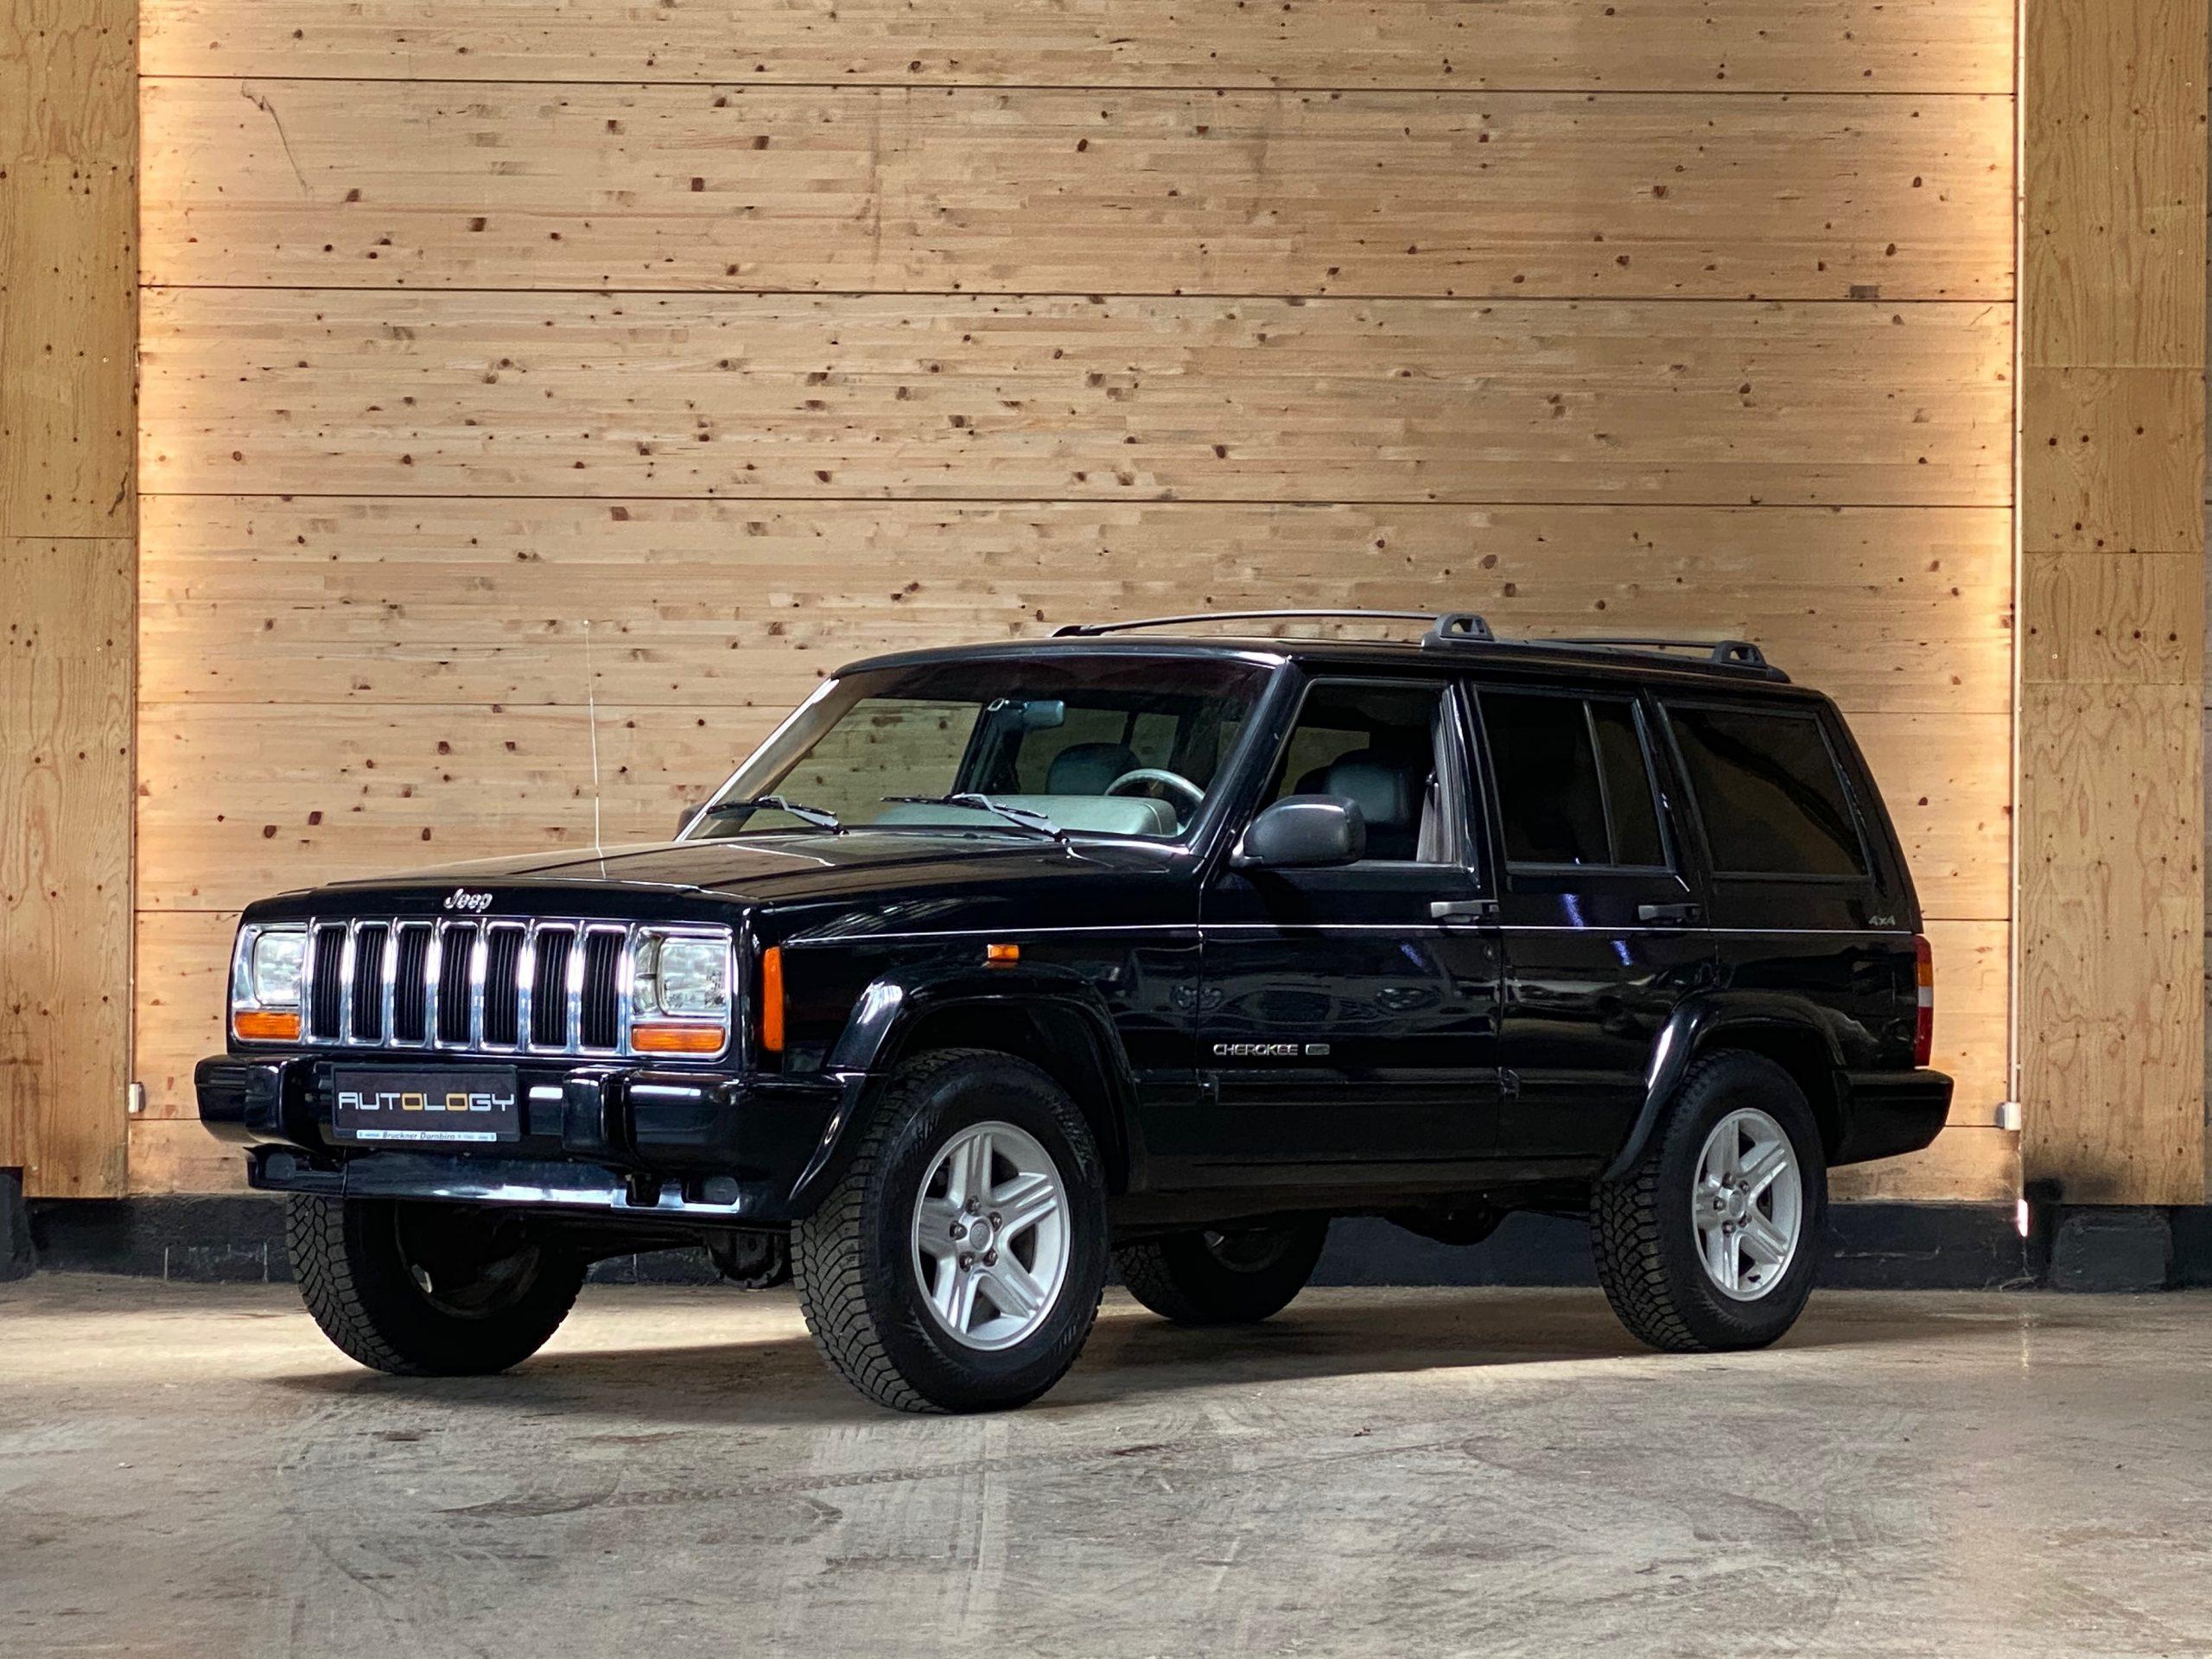 Jeep Cherokee 4.0 Limited XJ.2